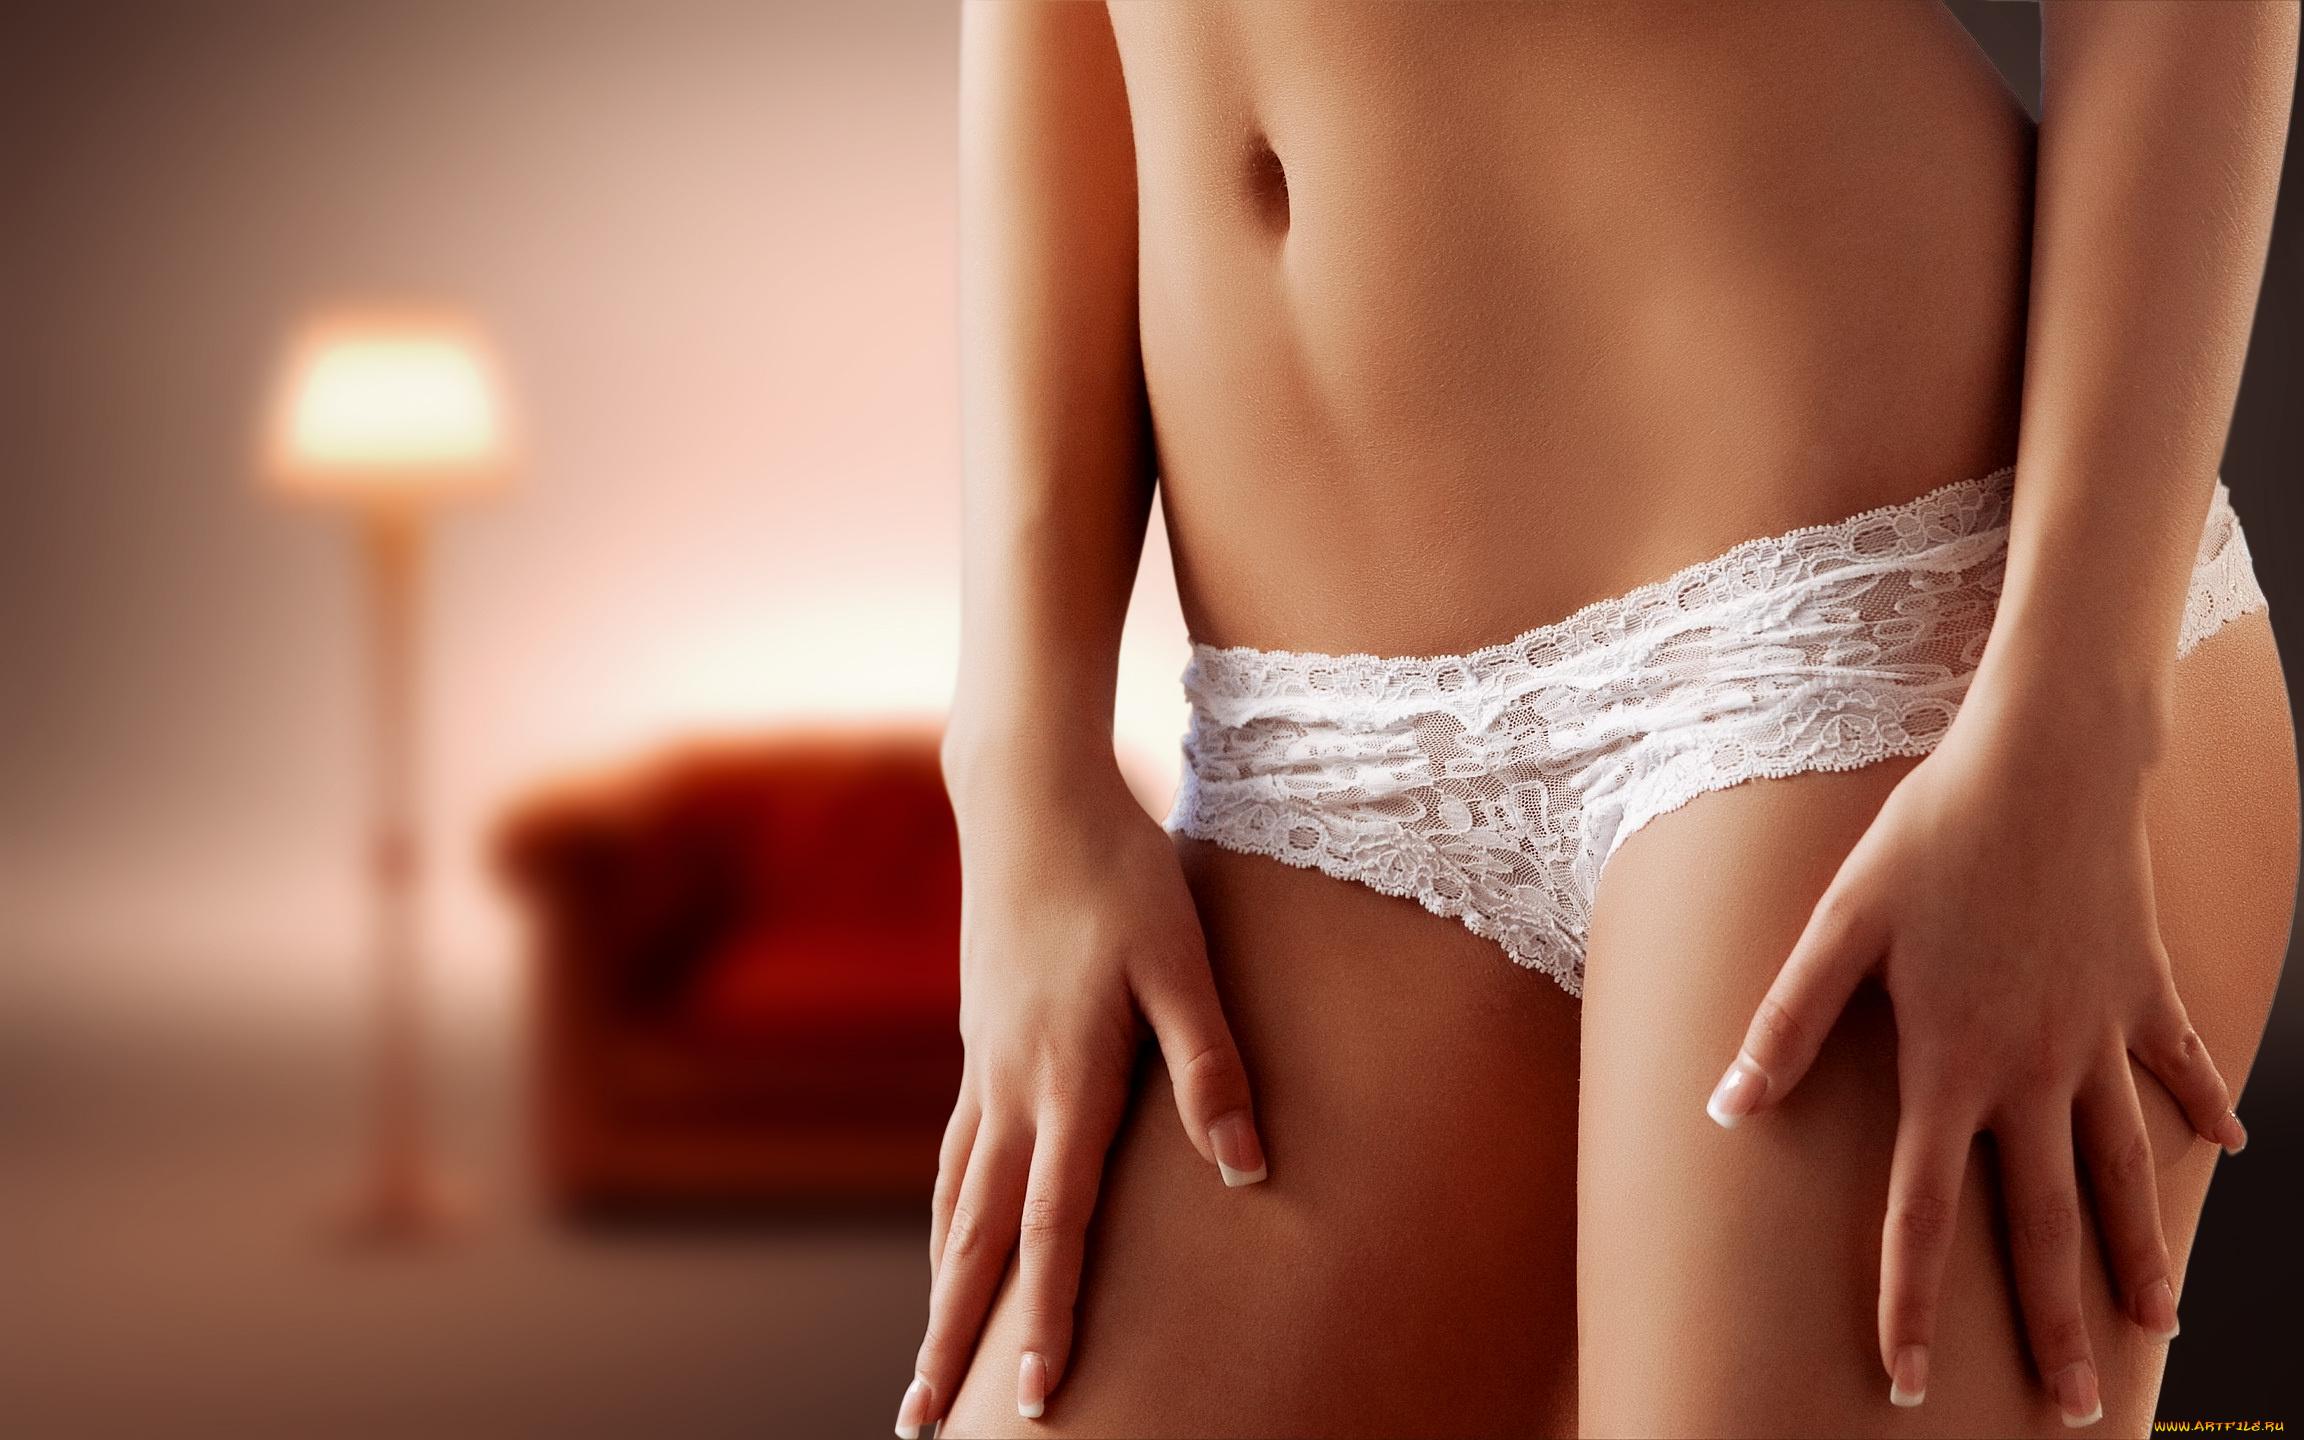 Женские прелести тела